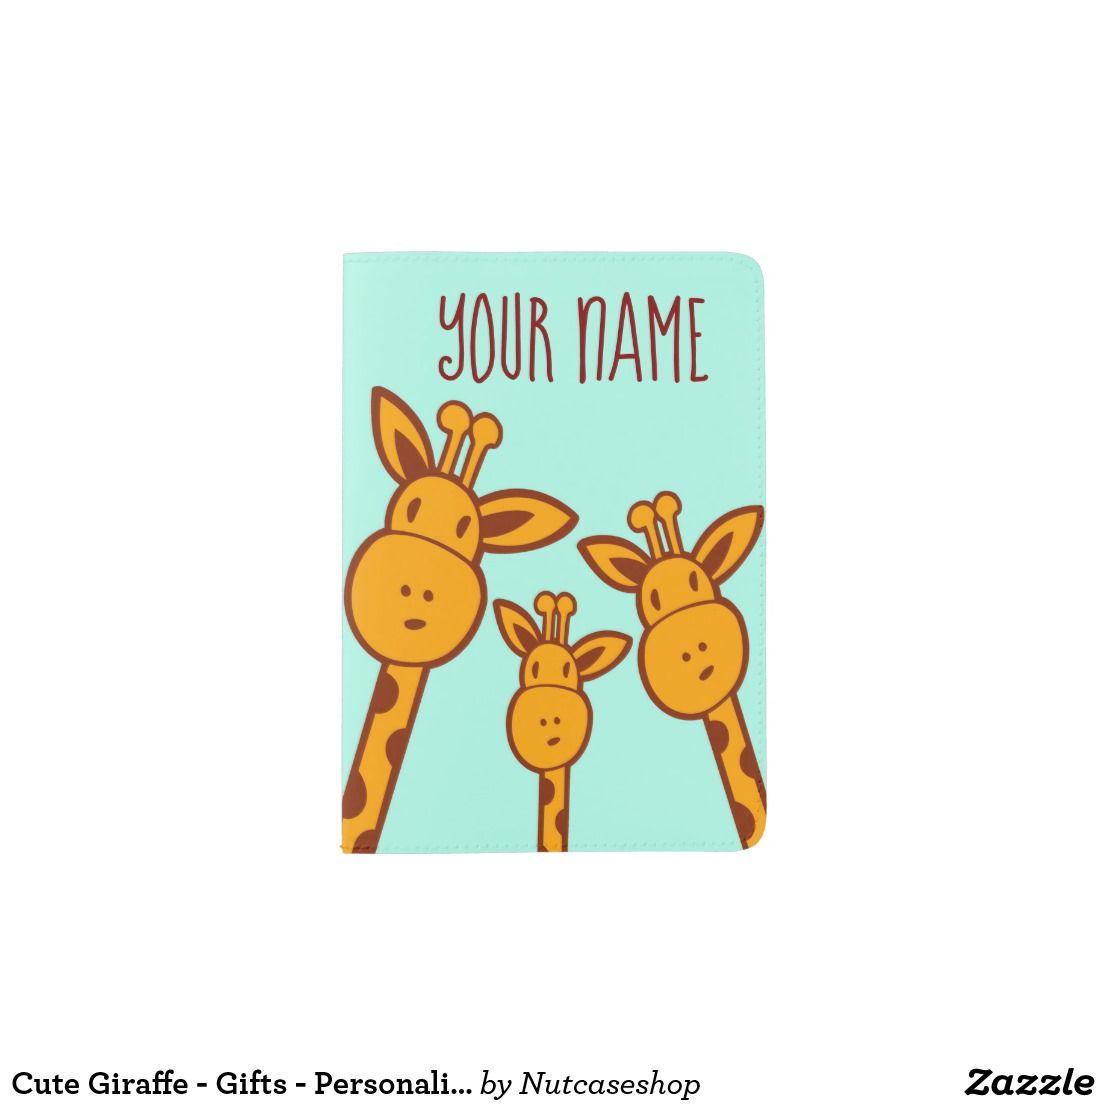 Cute Giraffe - Gifts - Personalized Passport Cover